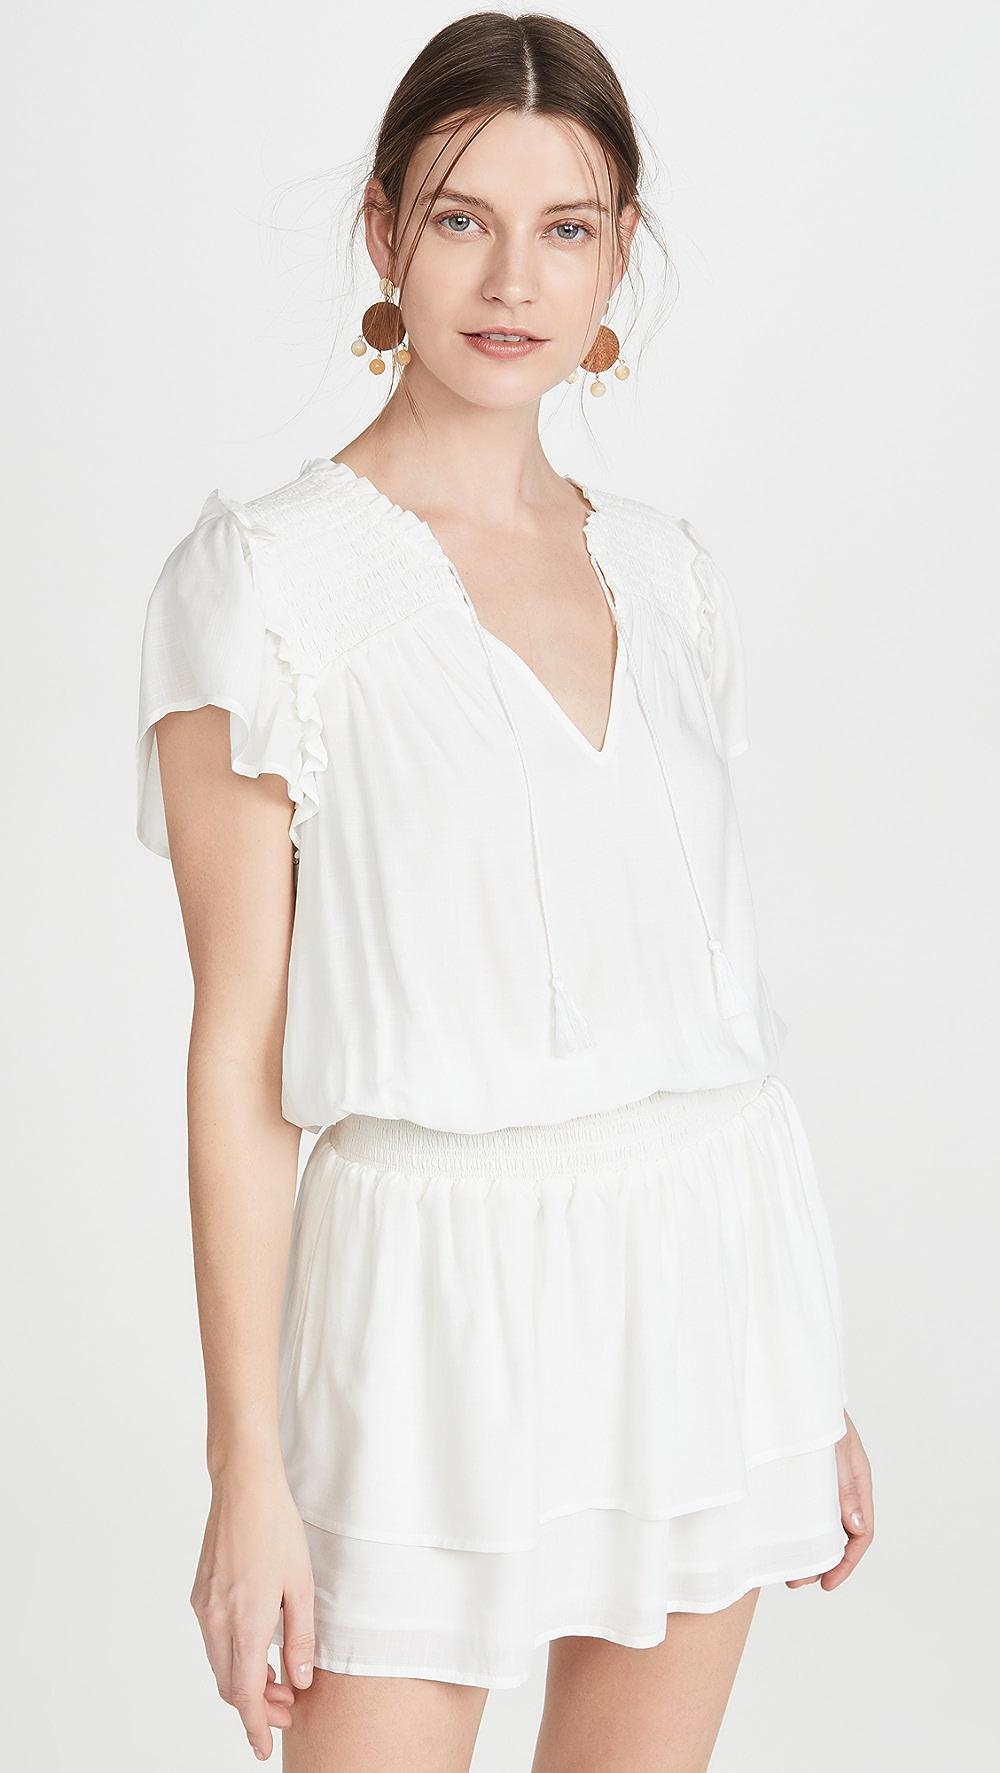 Industrious Paige - Cristina Dress Online Discount